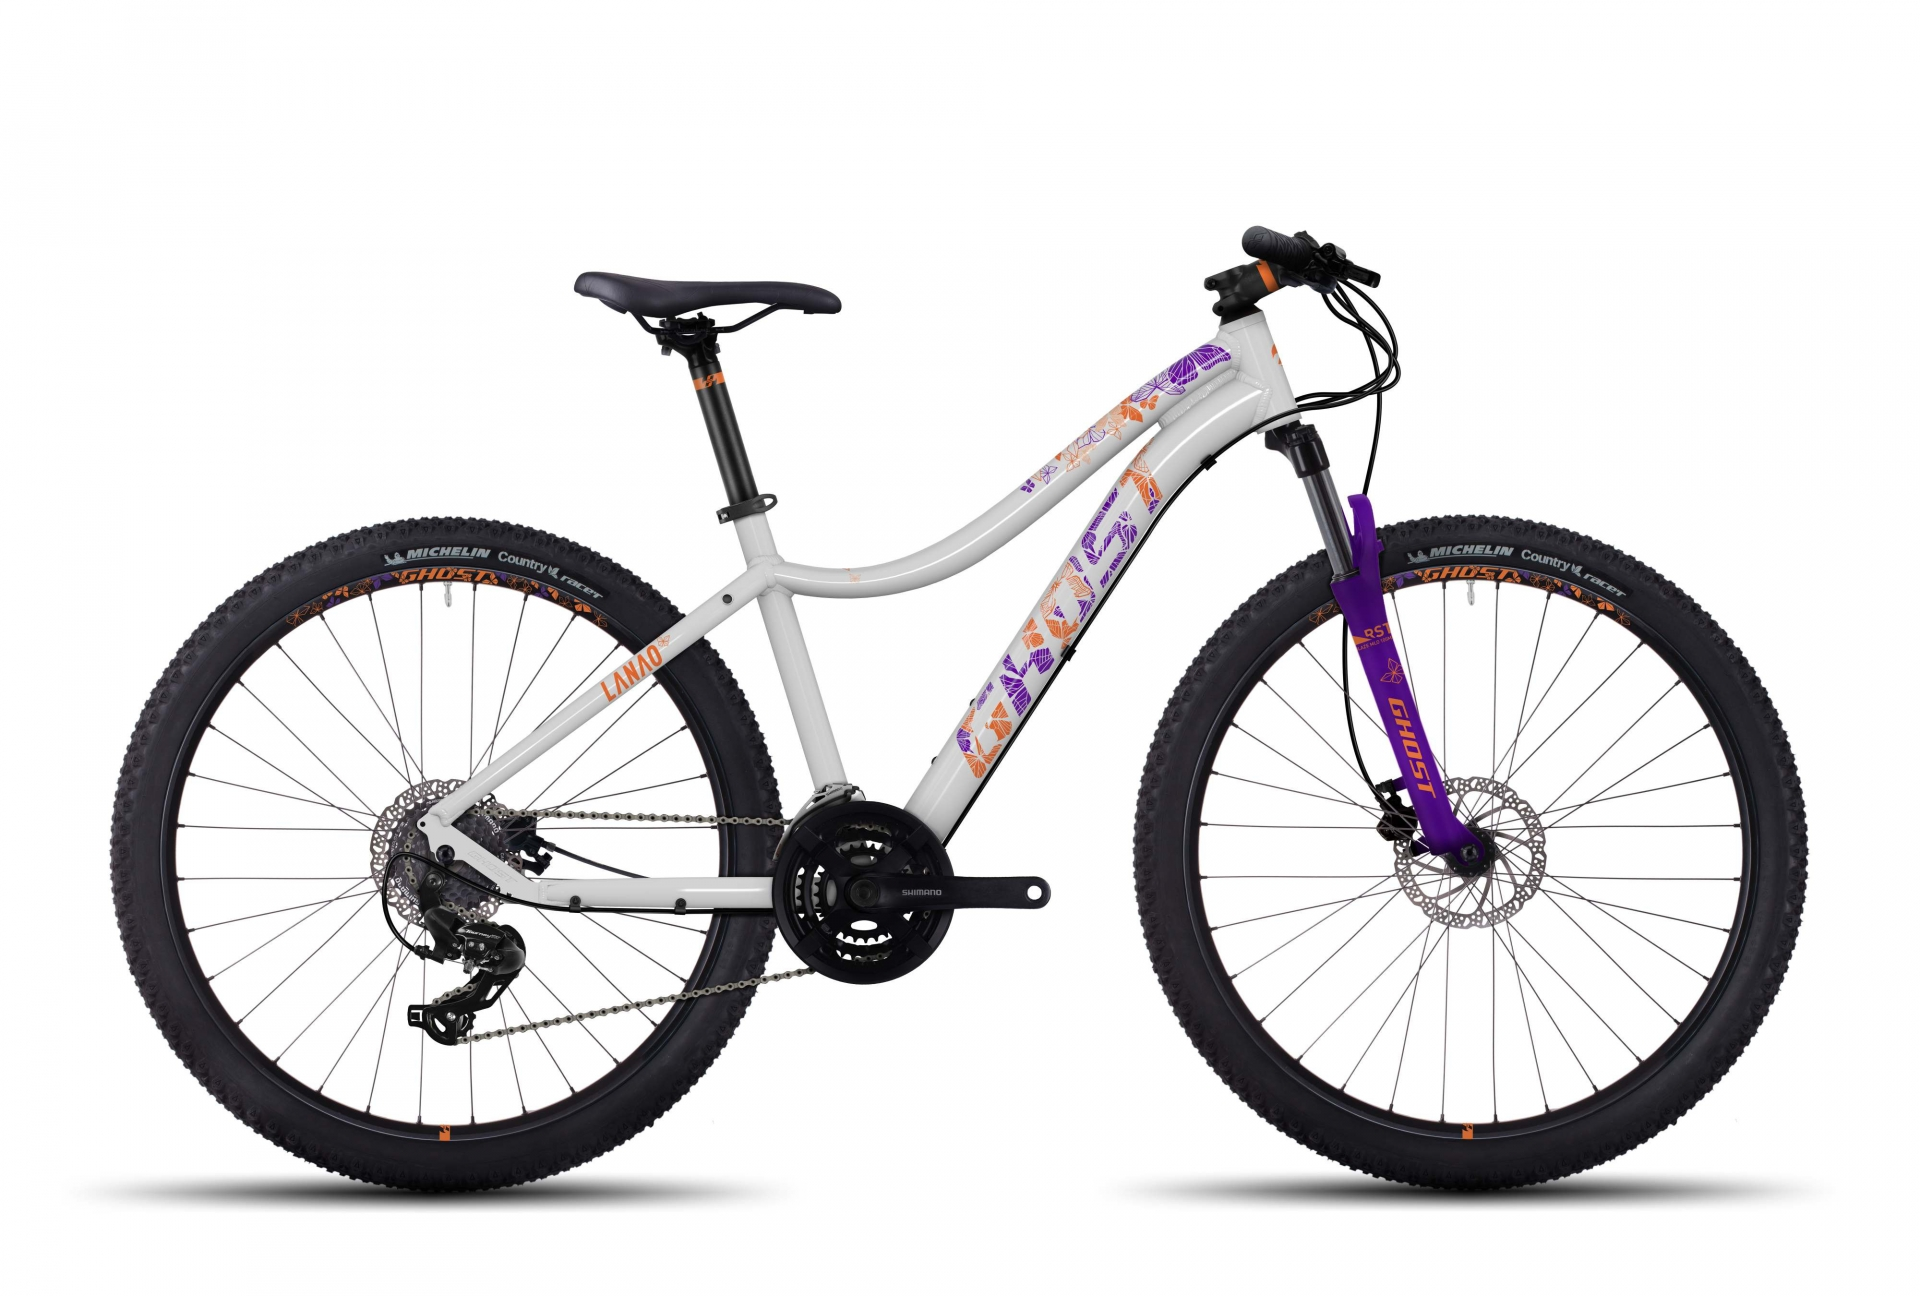 VTT Femme semi-rigide Ghost Lanao 1 27,5 blanc/violet - XXS